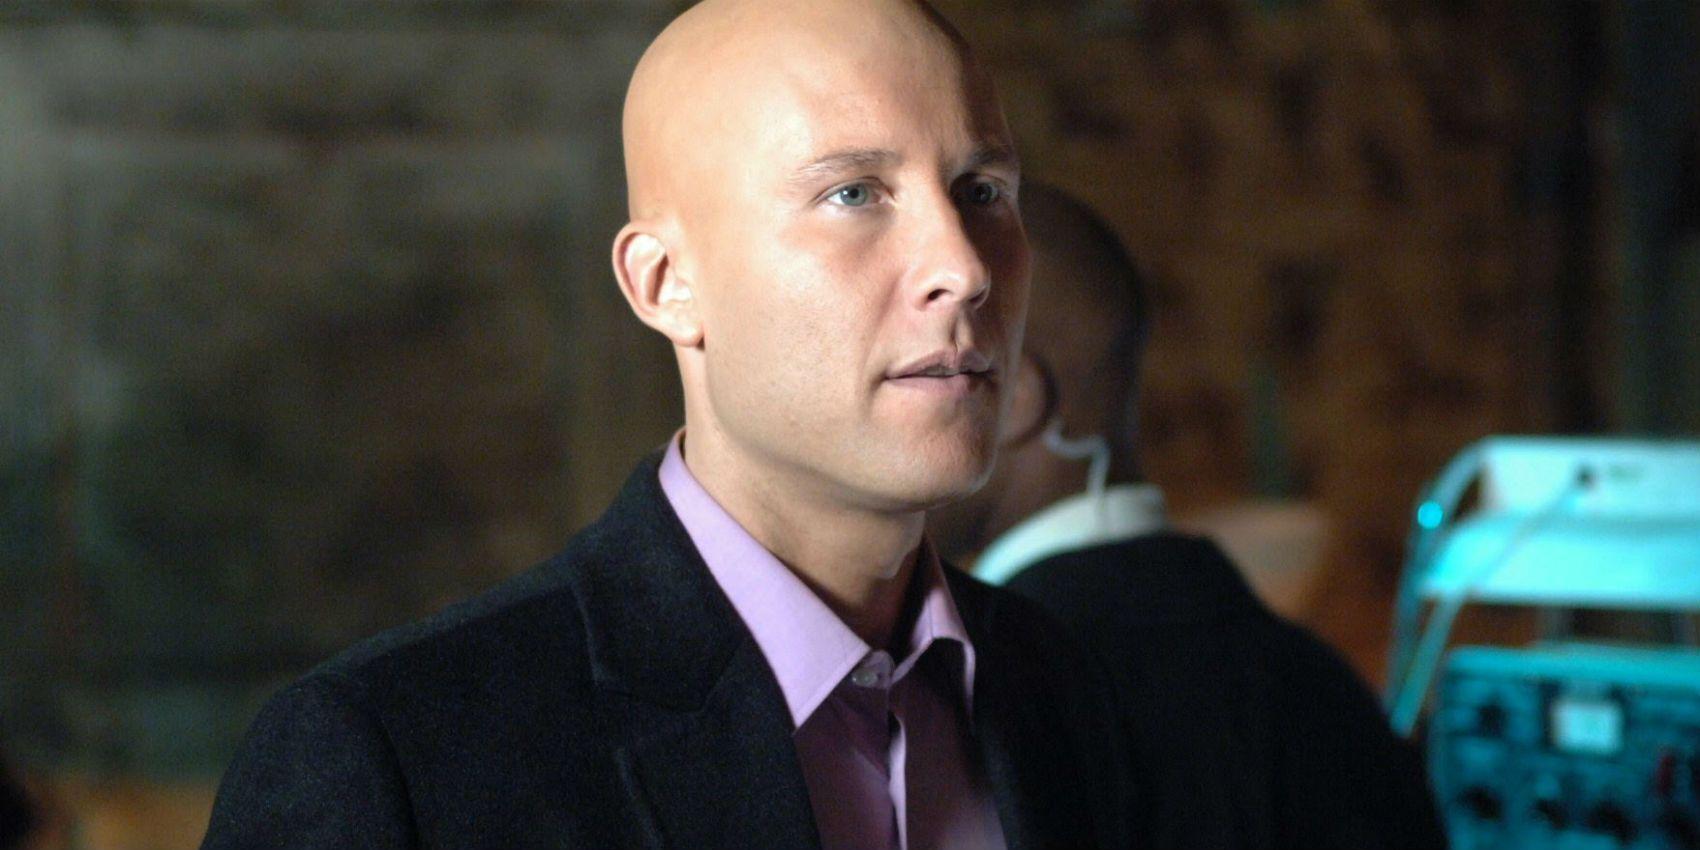 Smallville Fans Want Michael Rosenbaum To Play Supergirl's Lex Luthor